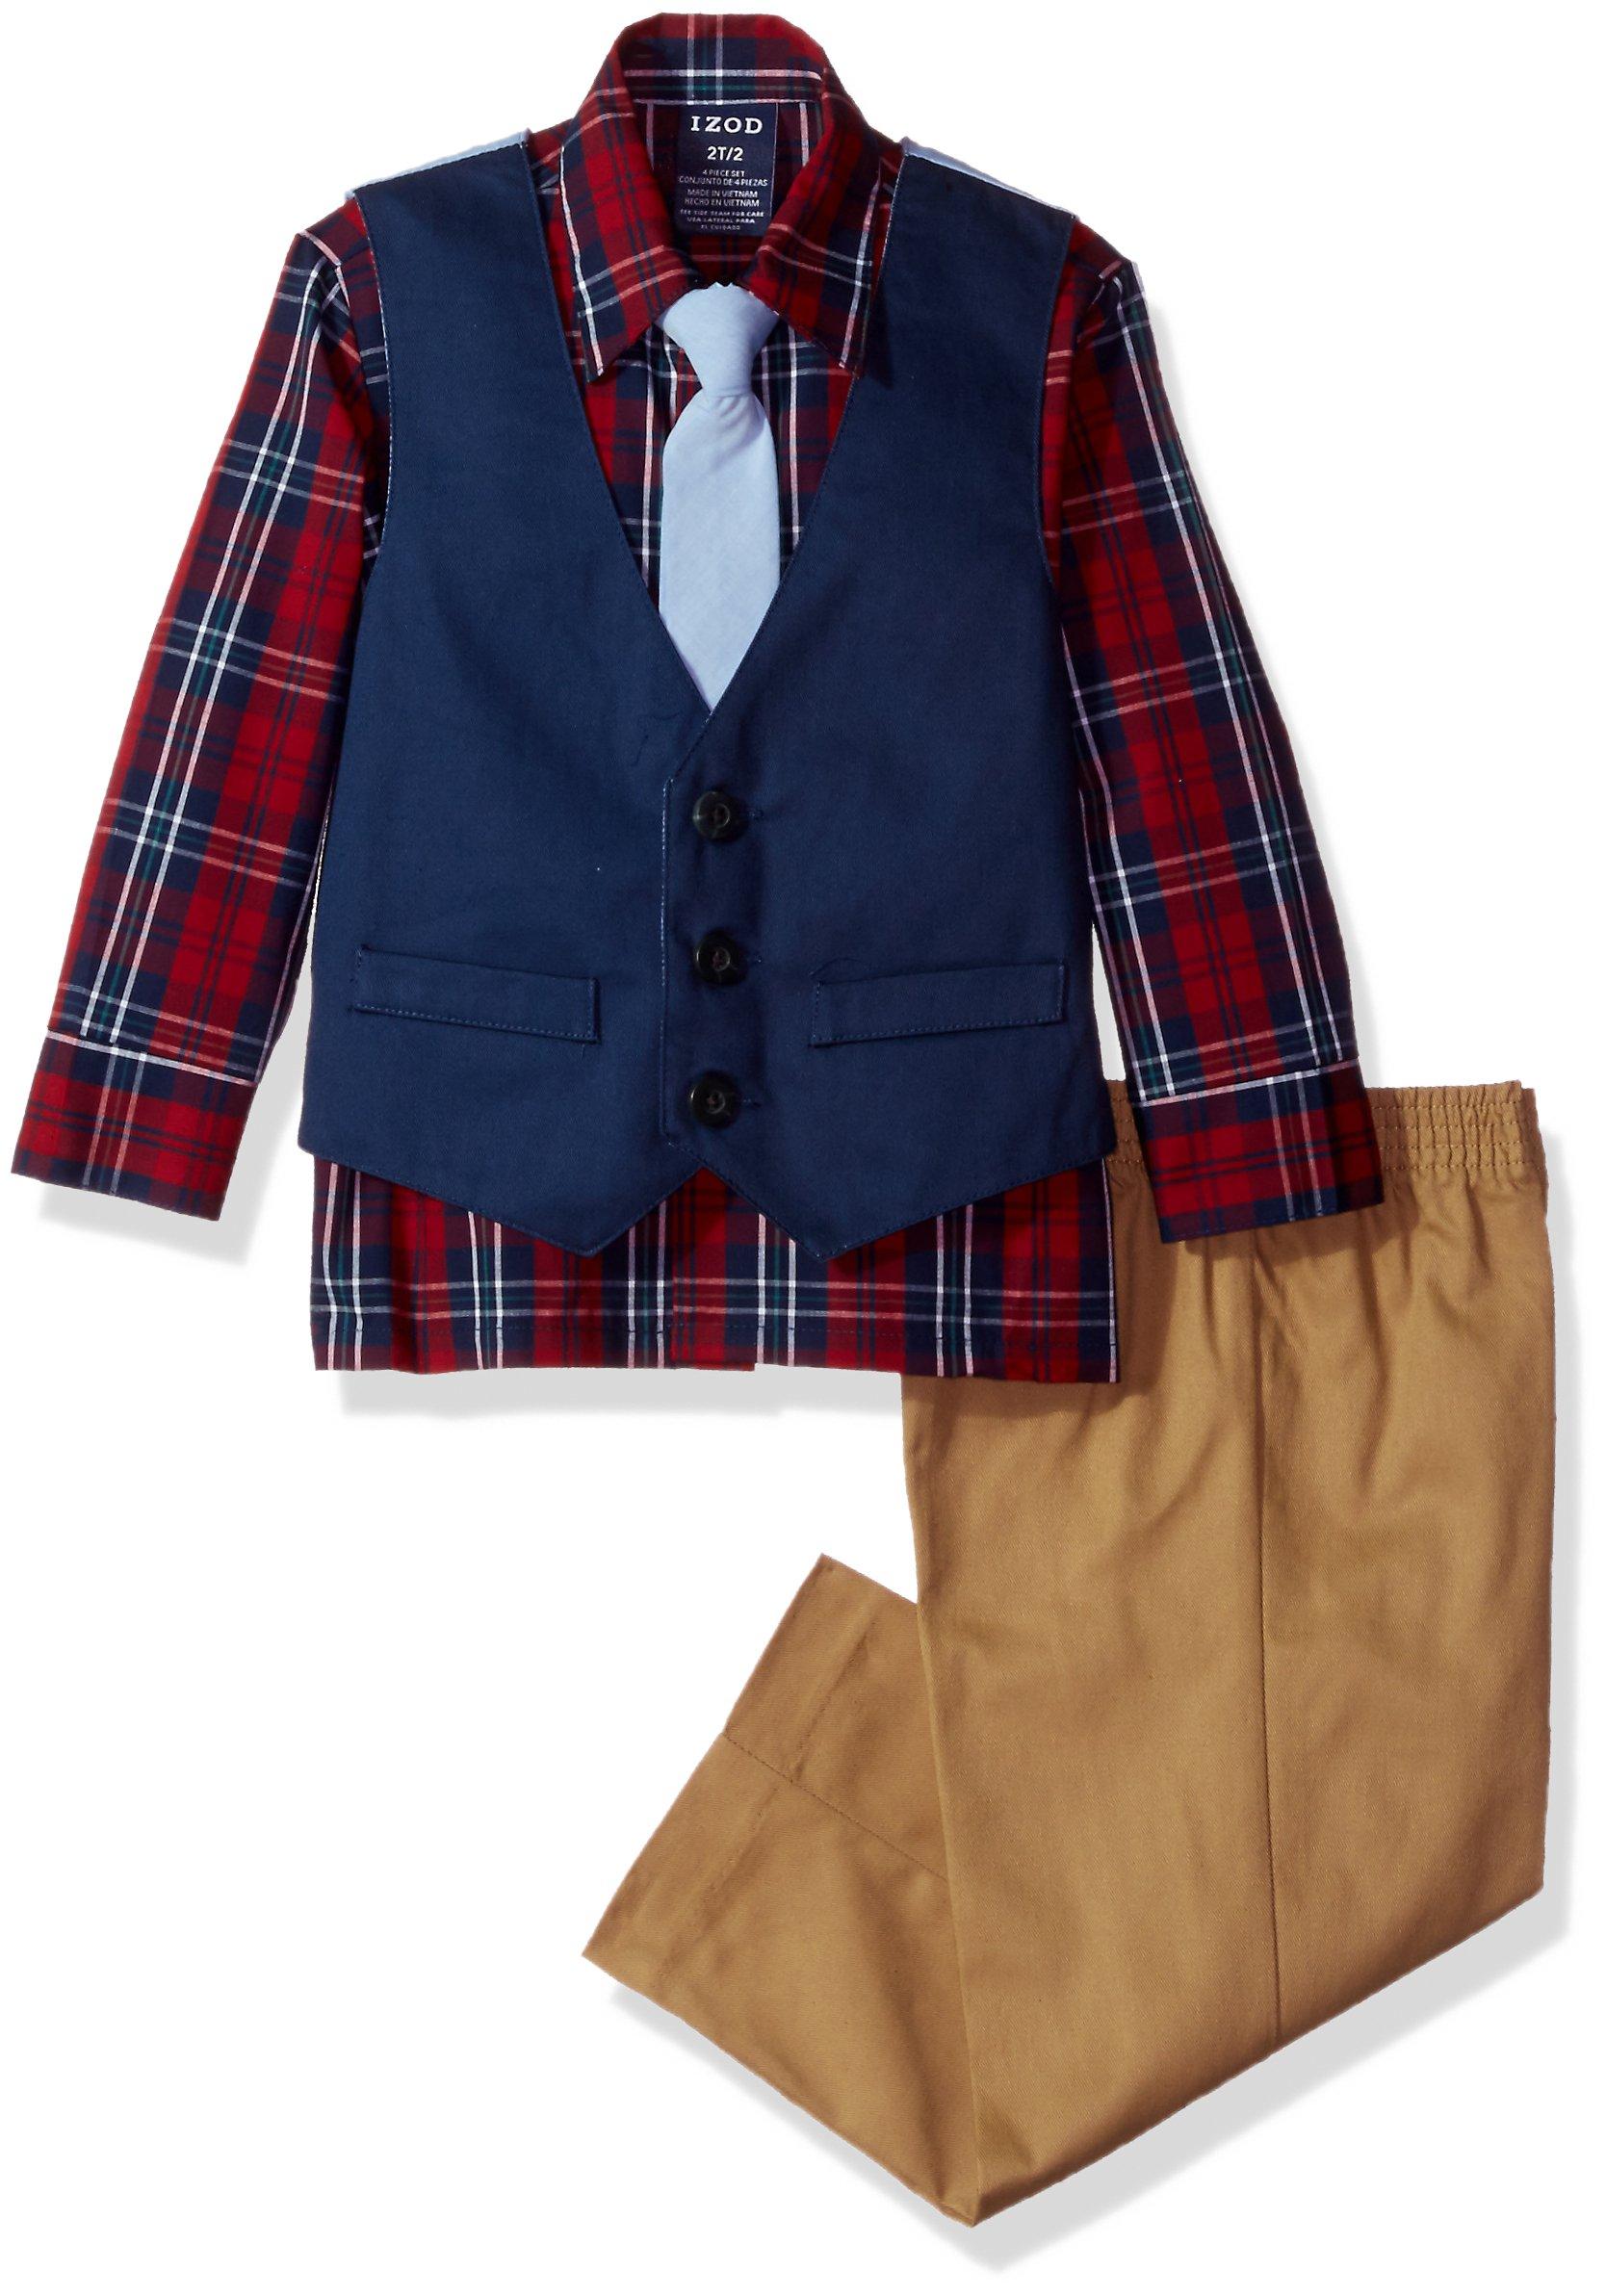 Izod boys 4-Piece Formal Vest Set with Shirt, Vest, Pants, and Tie, Solid Dark Blue, 3T